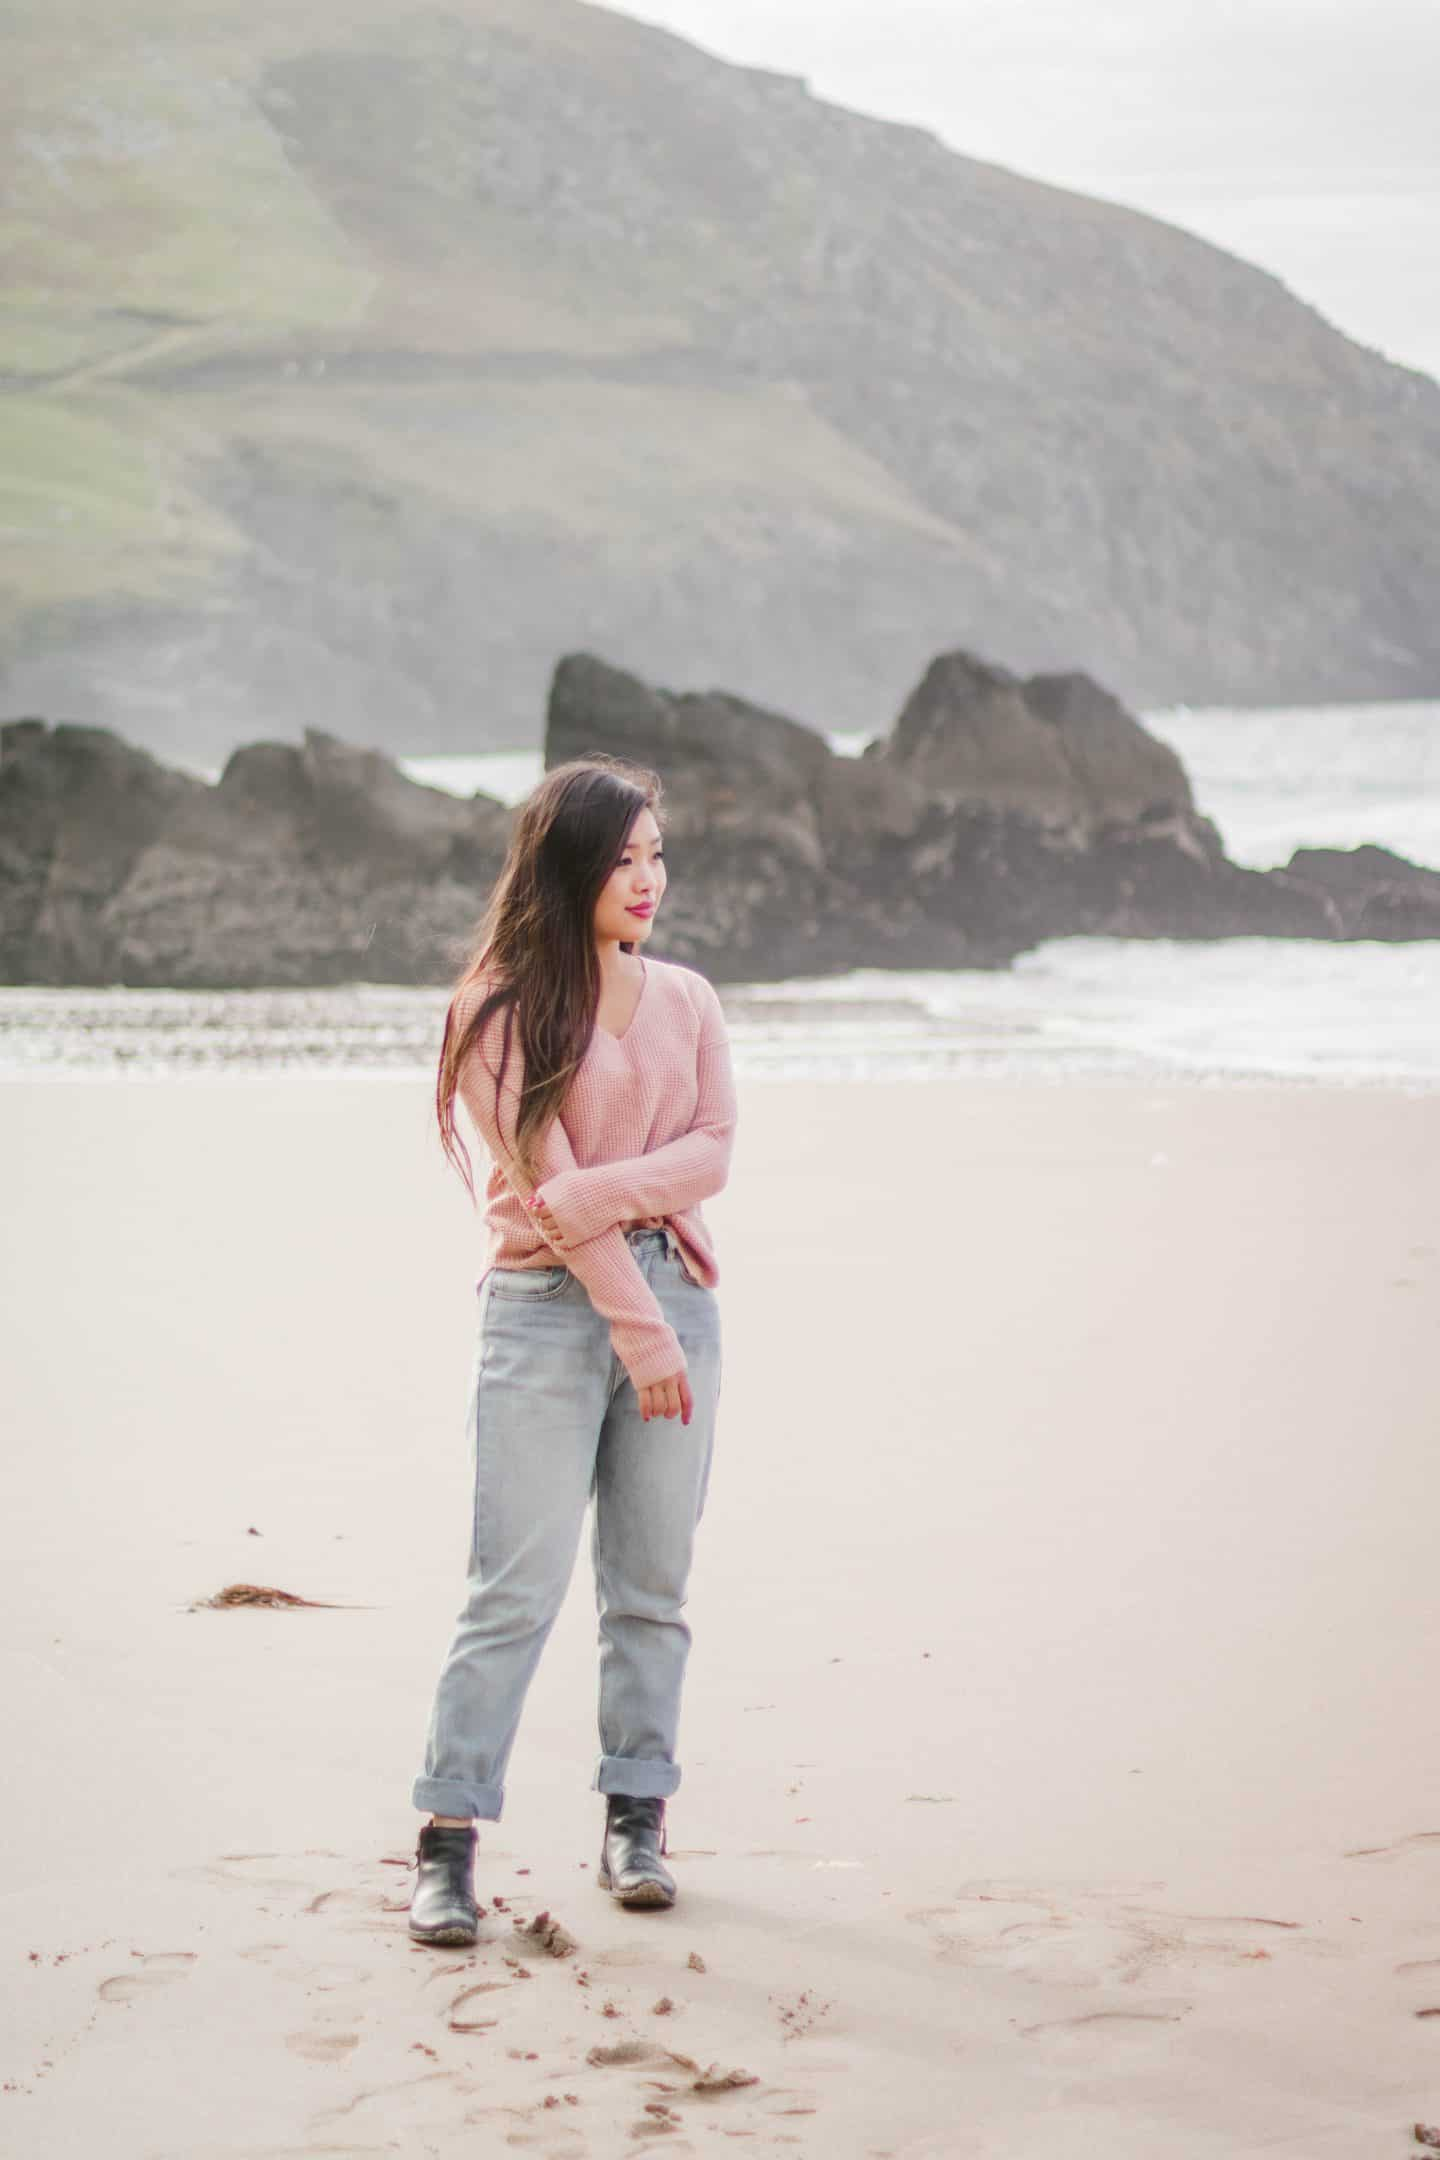 Coumeenole Beach on the Dingle Peninsula in Ireland